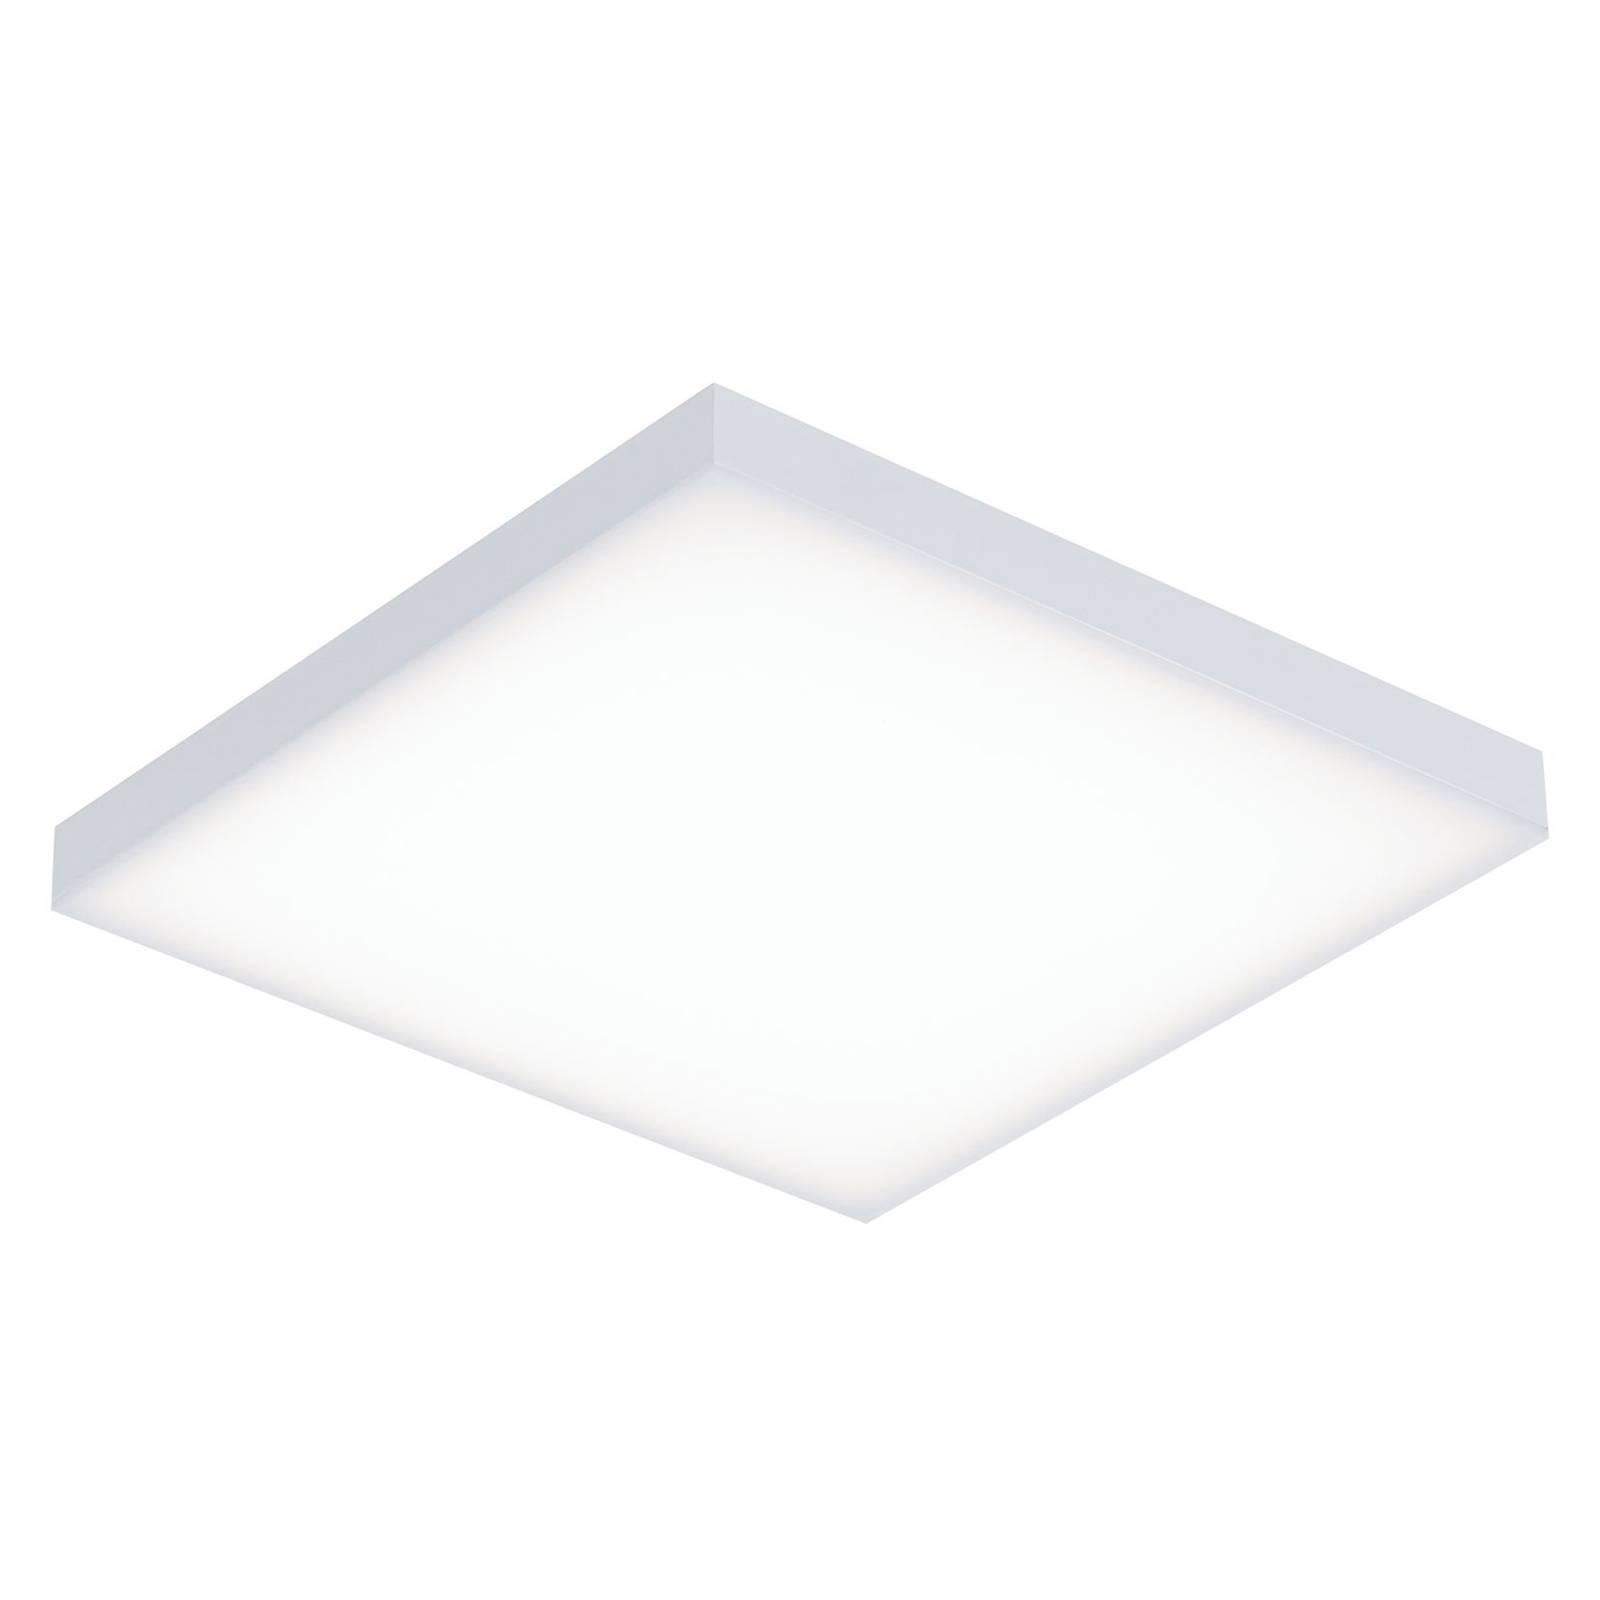 Paulmann Velora-LED-paneeli 3-step-dim 22,5x22,5cm